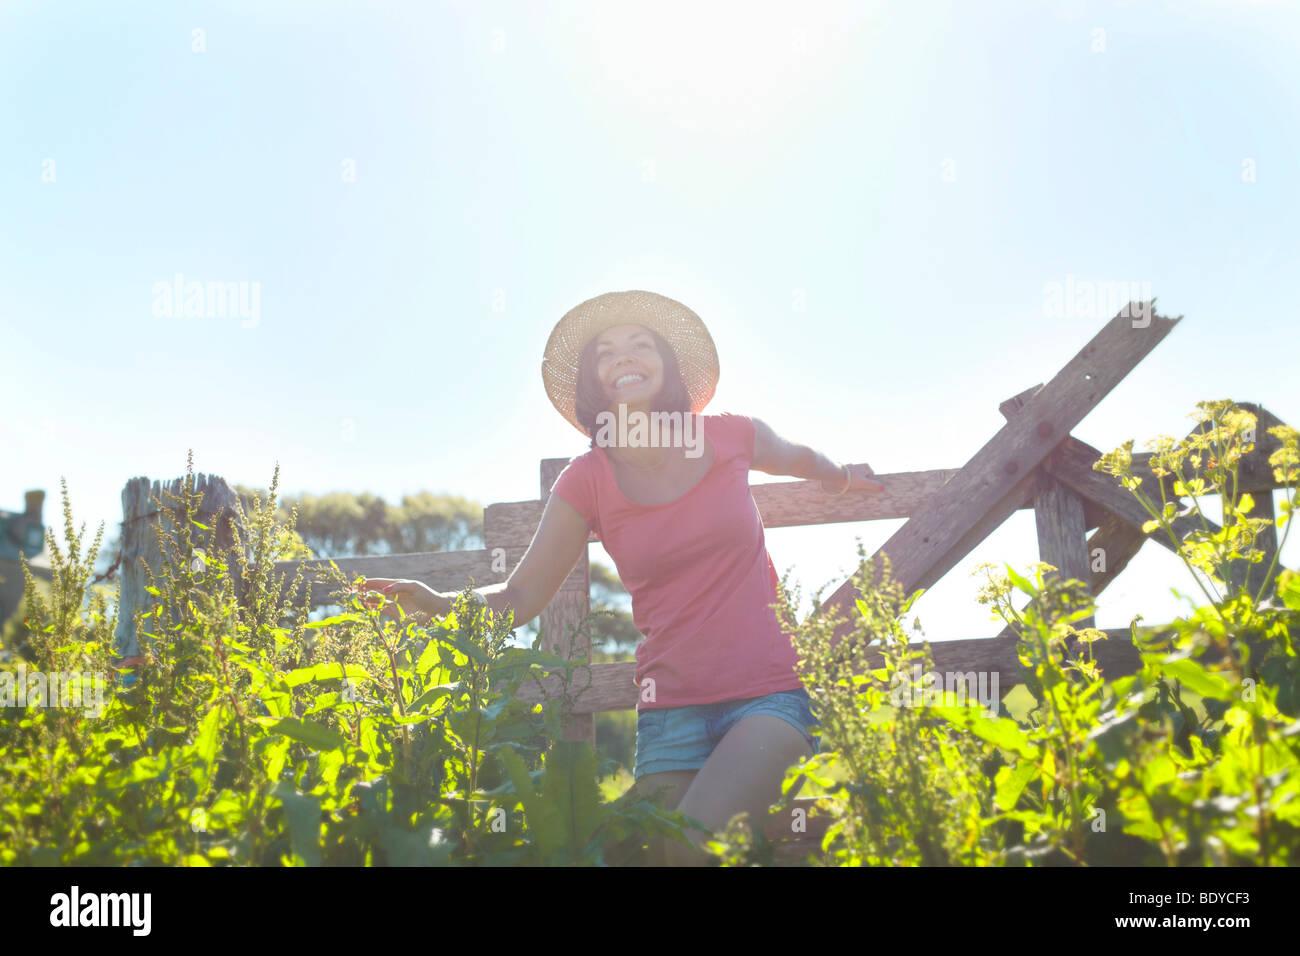 A girl climbing over a fence - Stock Image